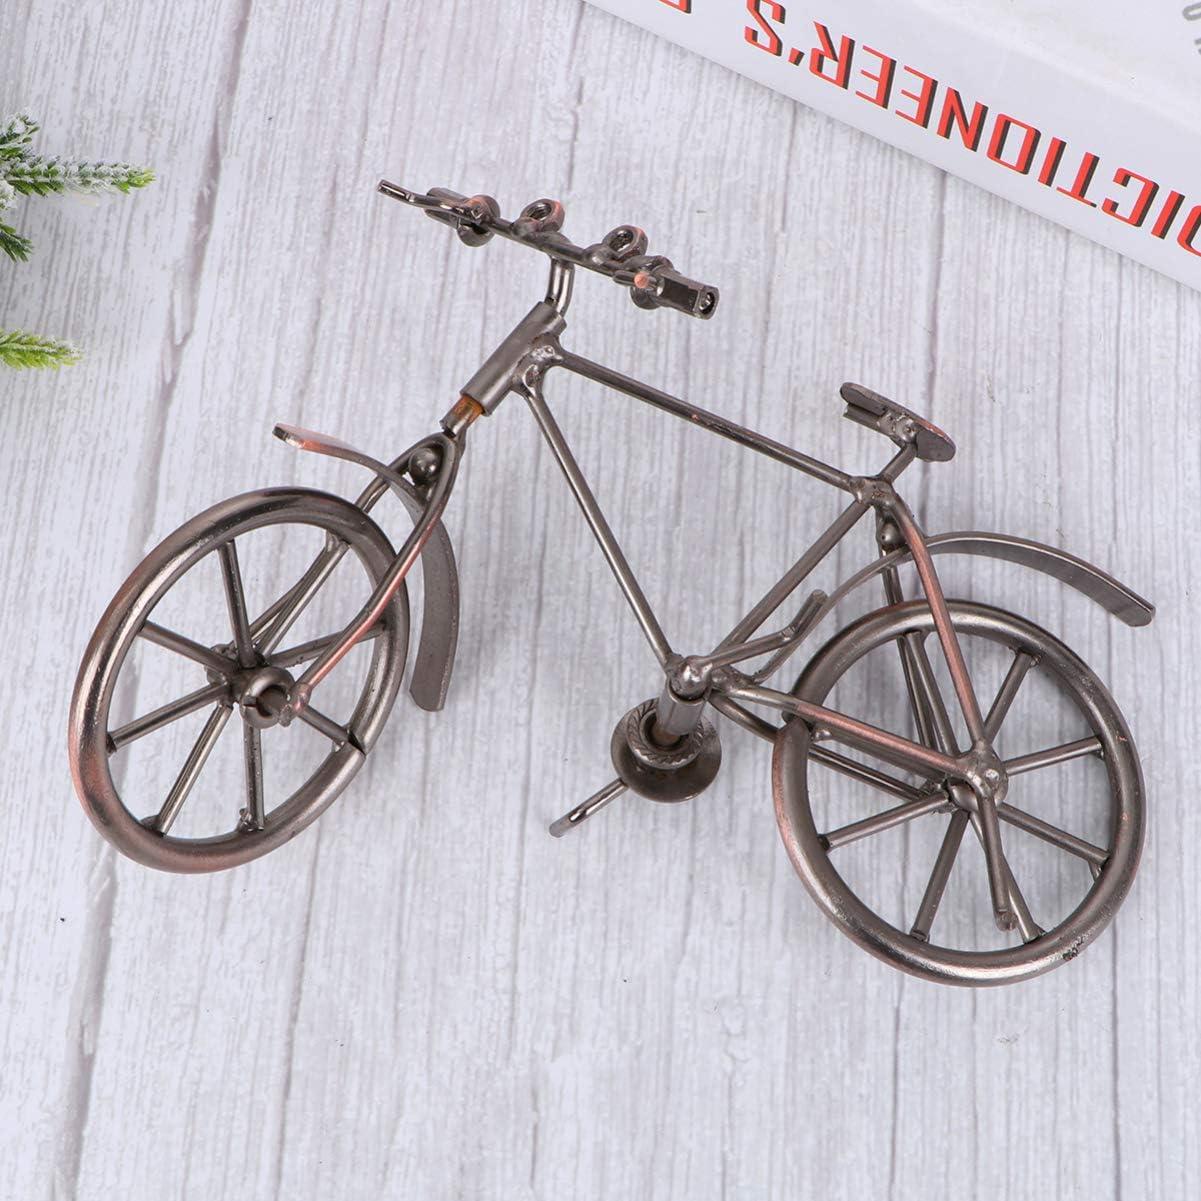 WINOMO Bicycle Model Metal Retro Creative Crafts Iron Bike Model Iron Bicycle Mold Old Bike Decor for Furnishing Home Decoration